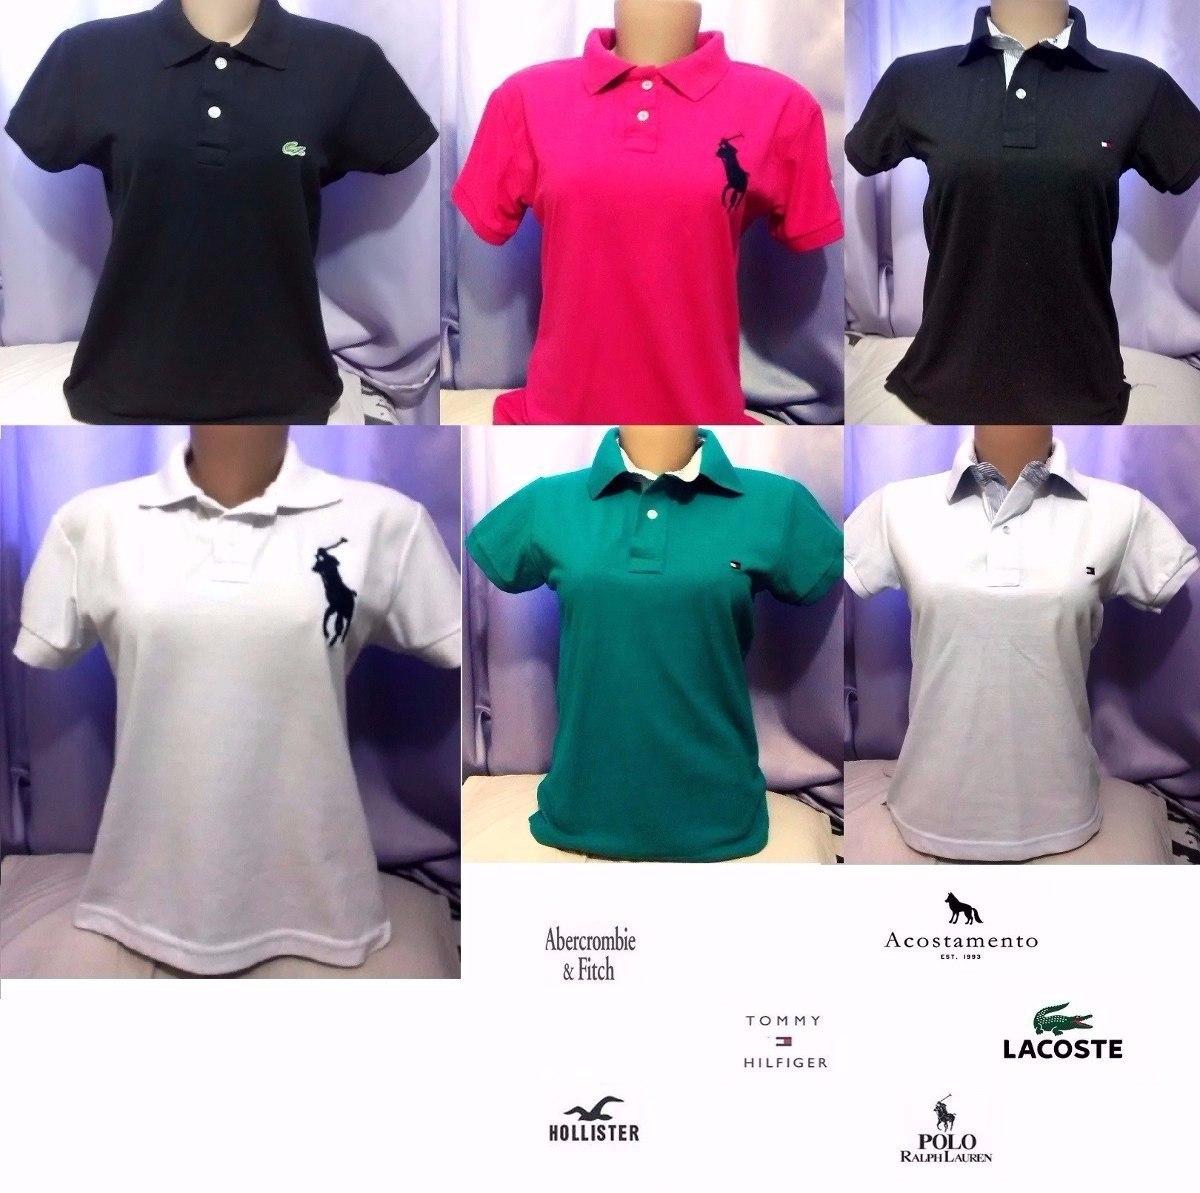 kit 10 camisas polo feminina varias marcas atacado lucre. Carregando zoom. 285951fe6d20b